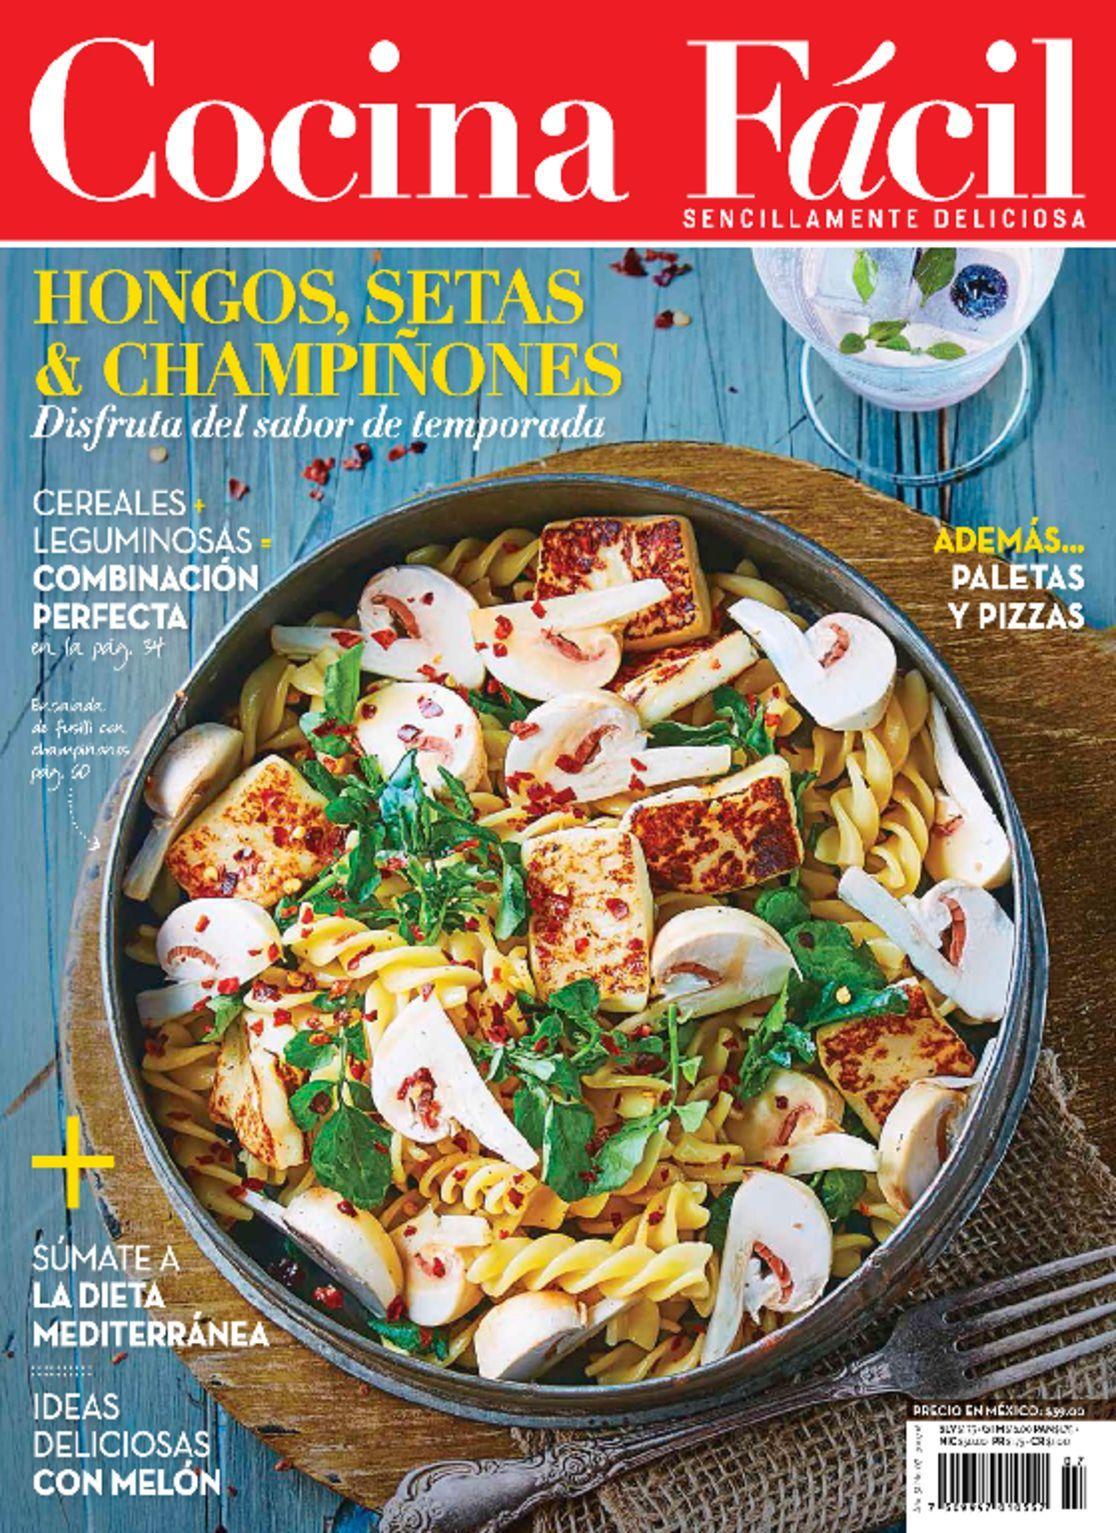 Cocina f cil digital magazine for Cocinar facil